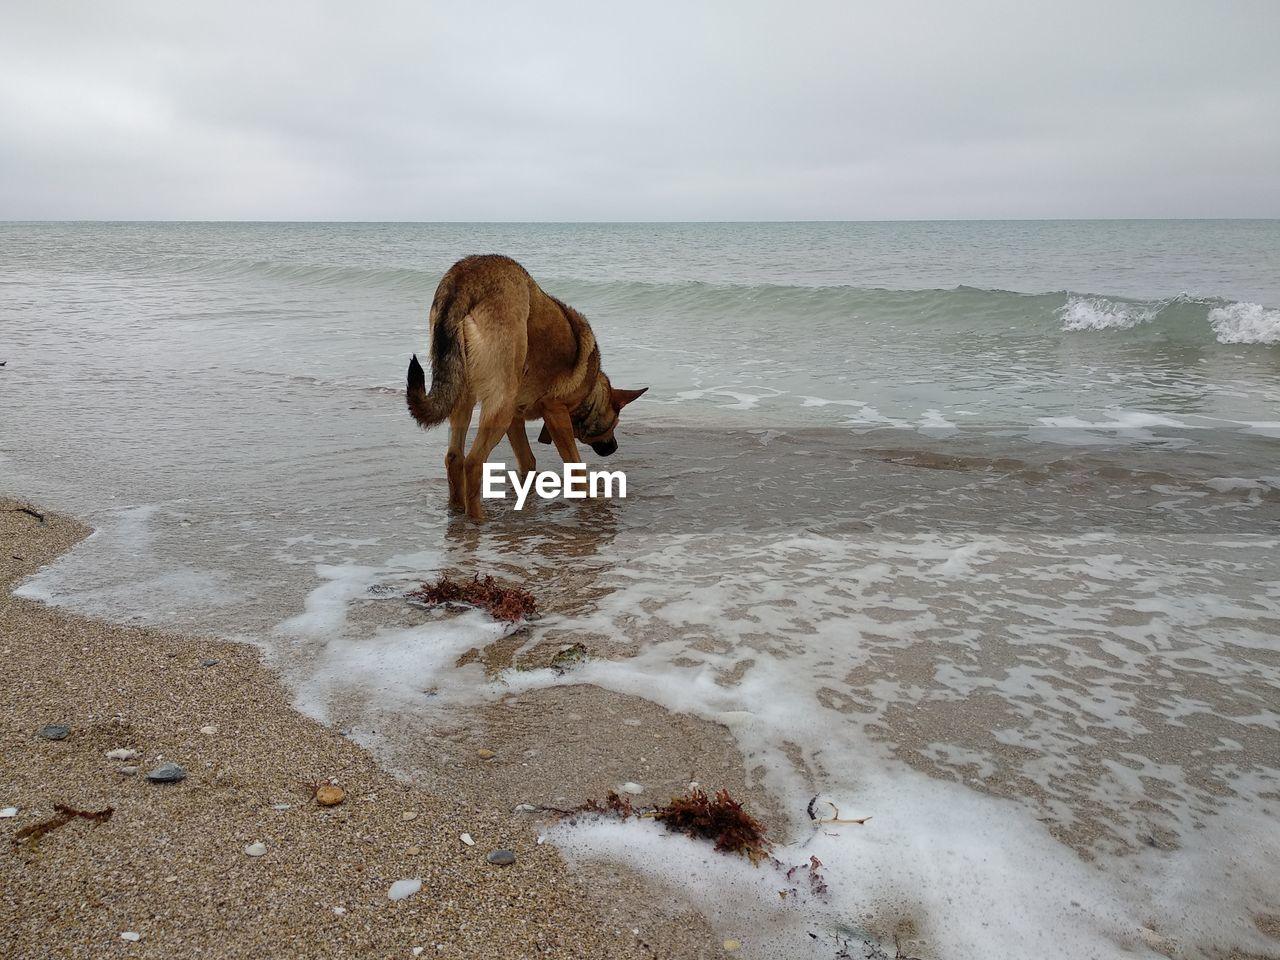 sea, water, horizon over water, horizon, mammal, sky, animal themes, animal, domestic animals, beach, one animal, domestic, land, pets, vertebrate, canine, dog, motion, beauty in nature, no people